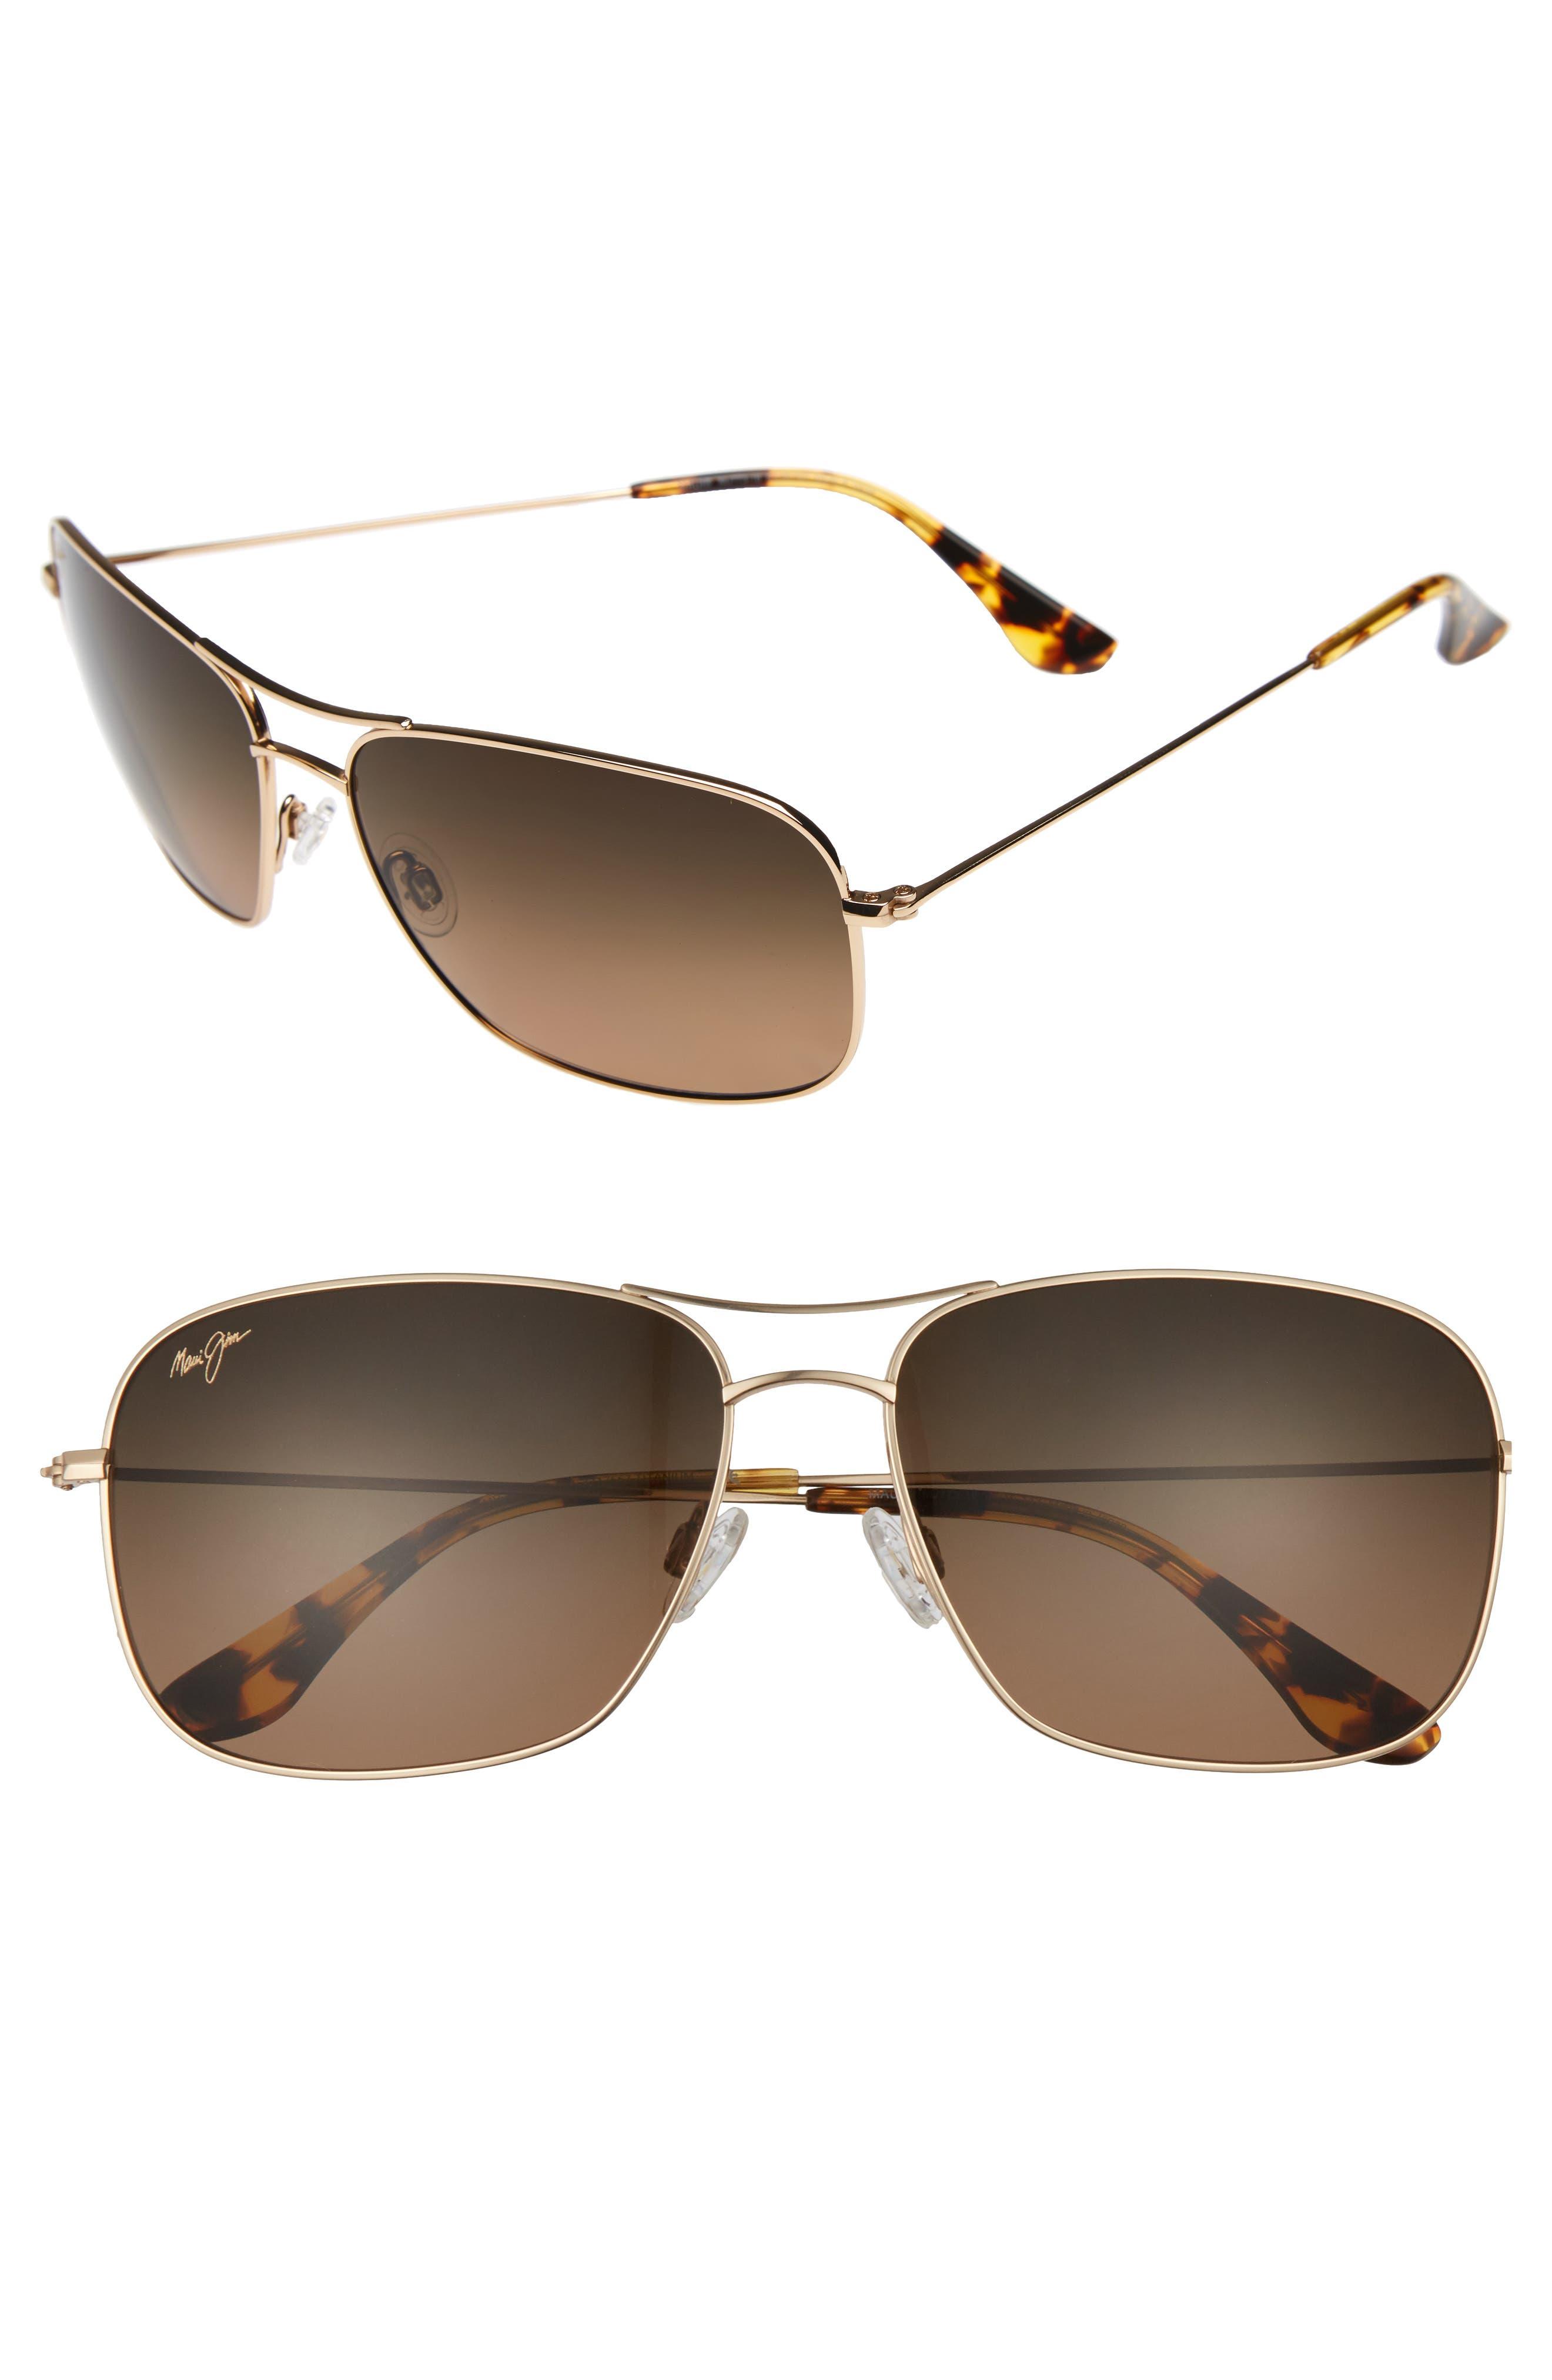 Maui Jim Breezeway 6m Polarizedplus2 Sunglasses -